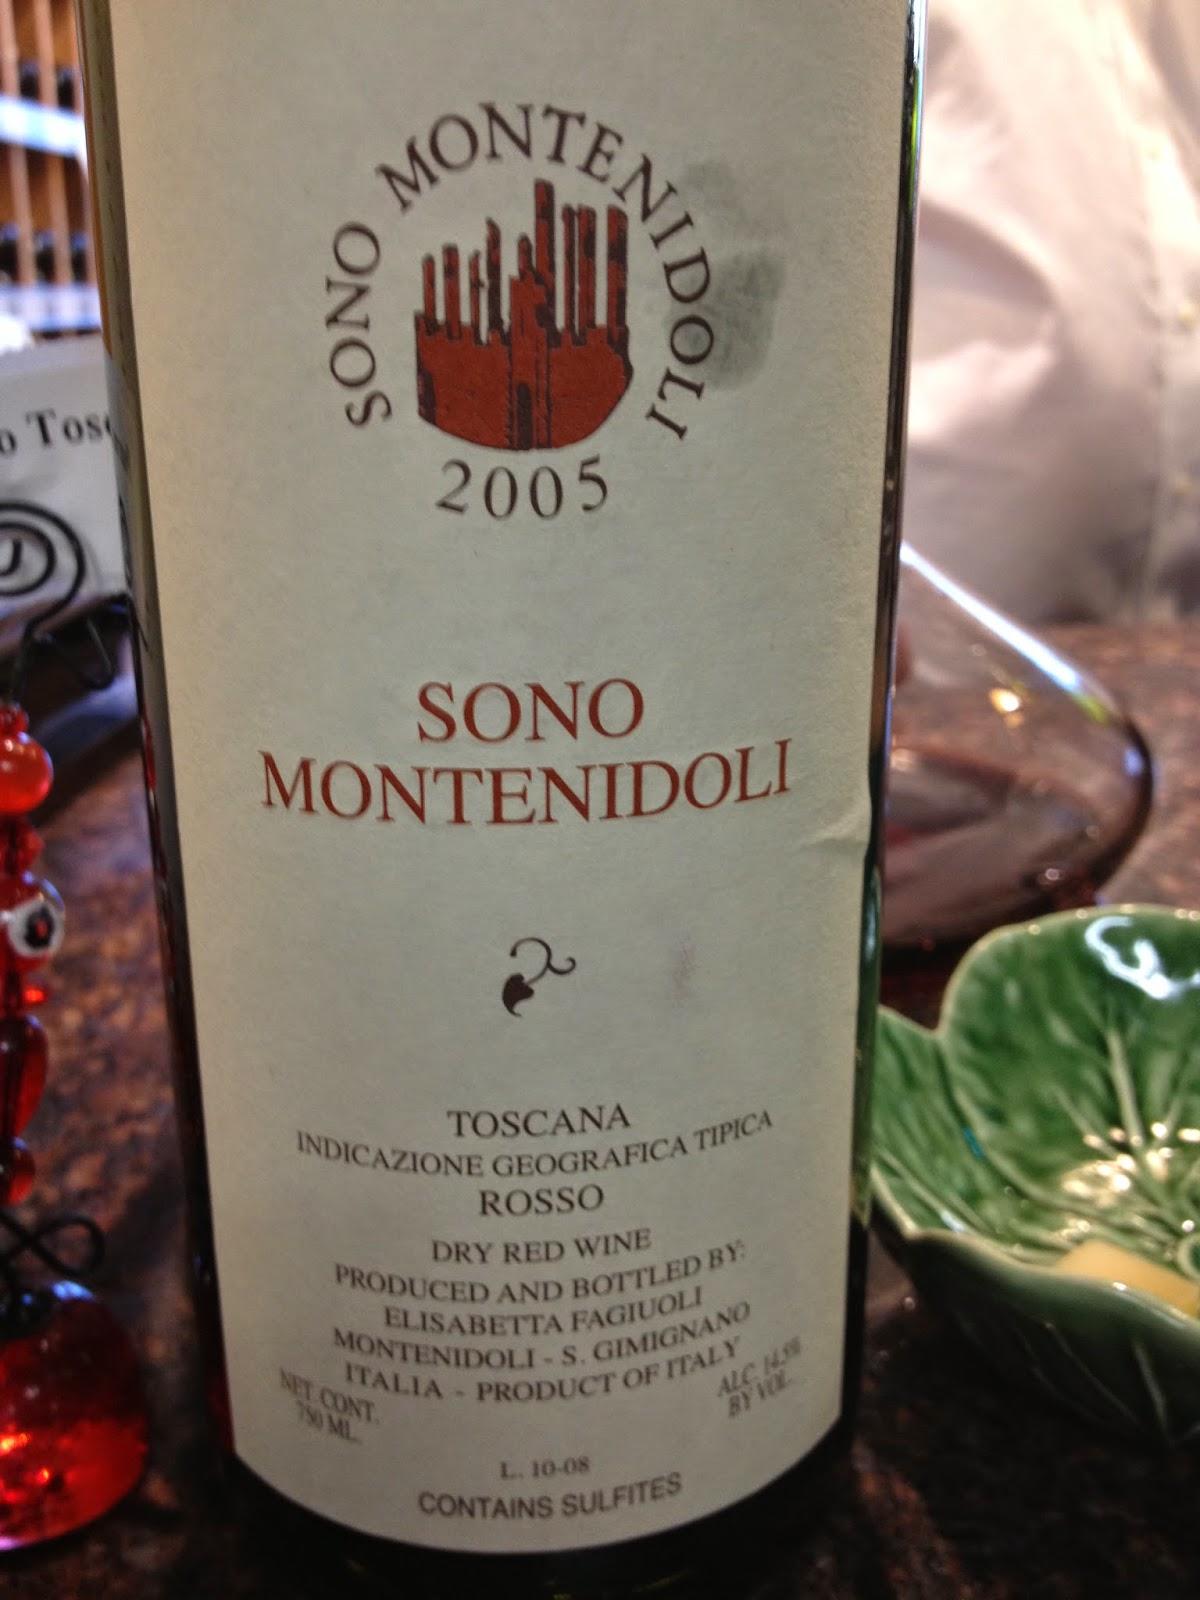 2005 Sono Montenidoli sangiovese